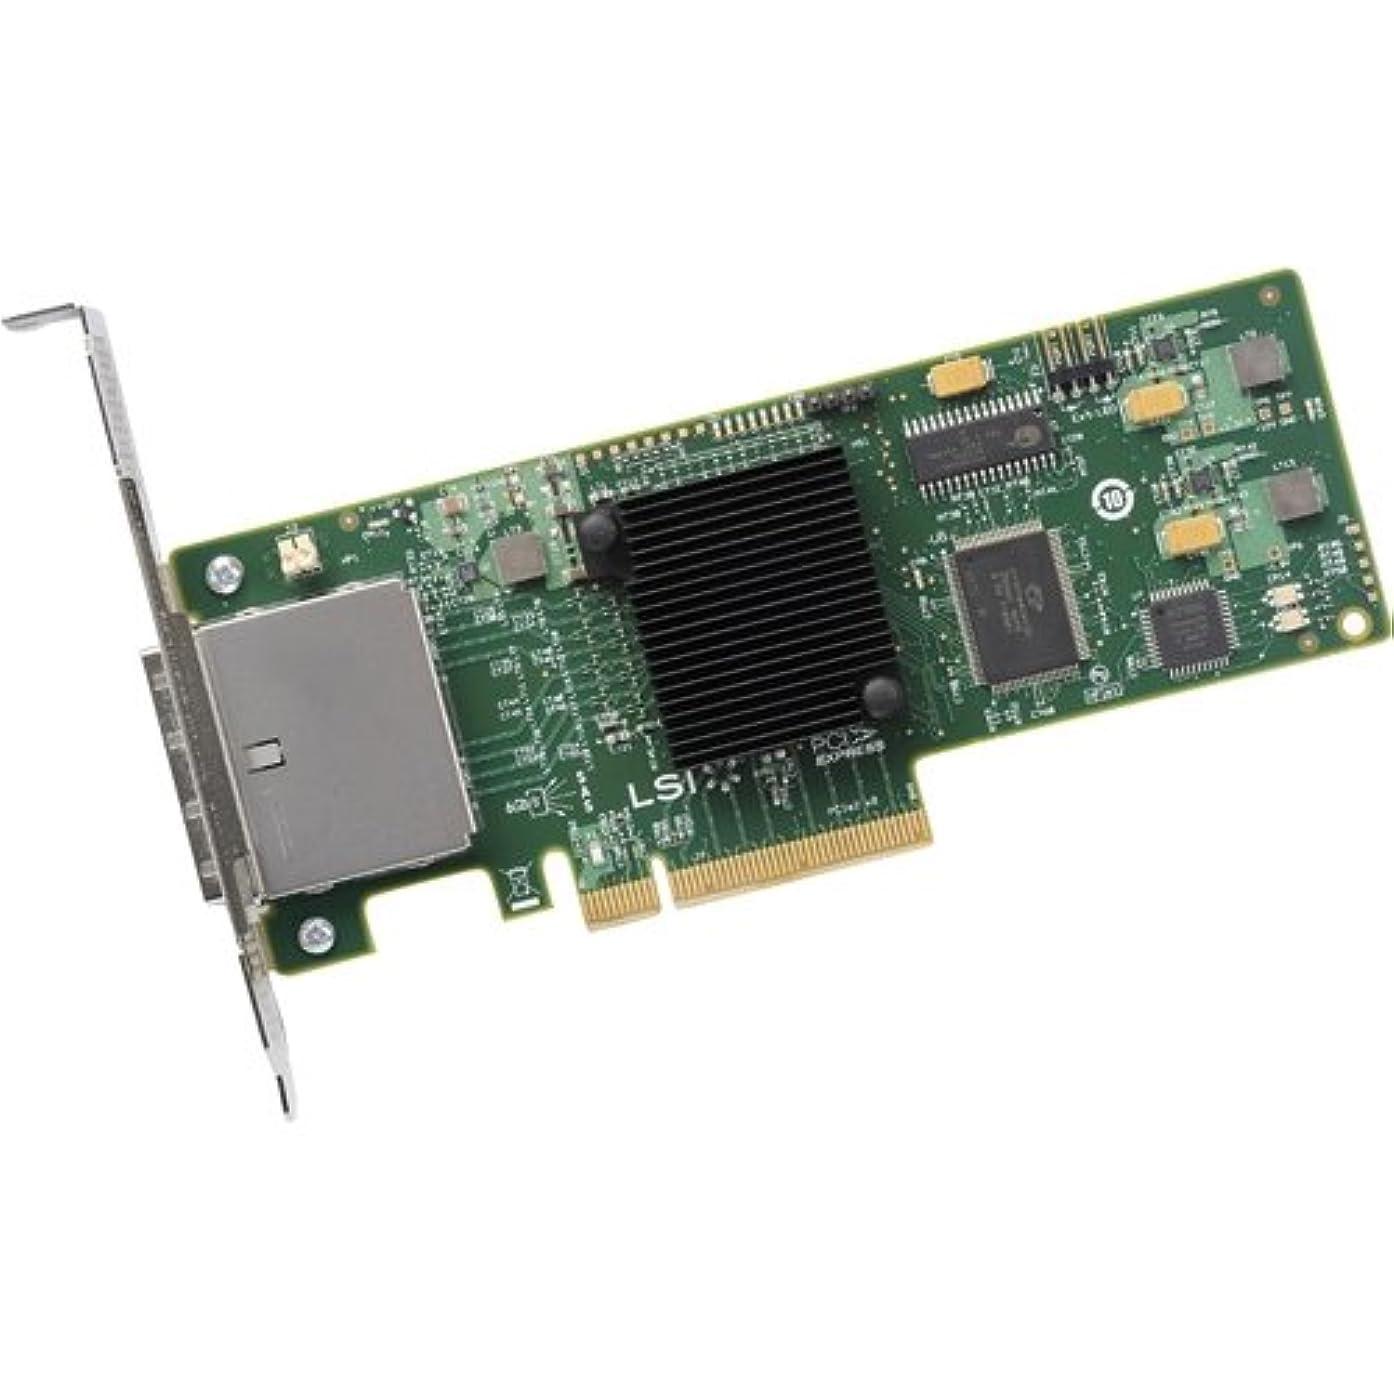 LSI Logic SAS9200-8E 8PORT Ext 6GB Sata+SAS Pcie 2.0